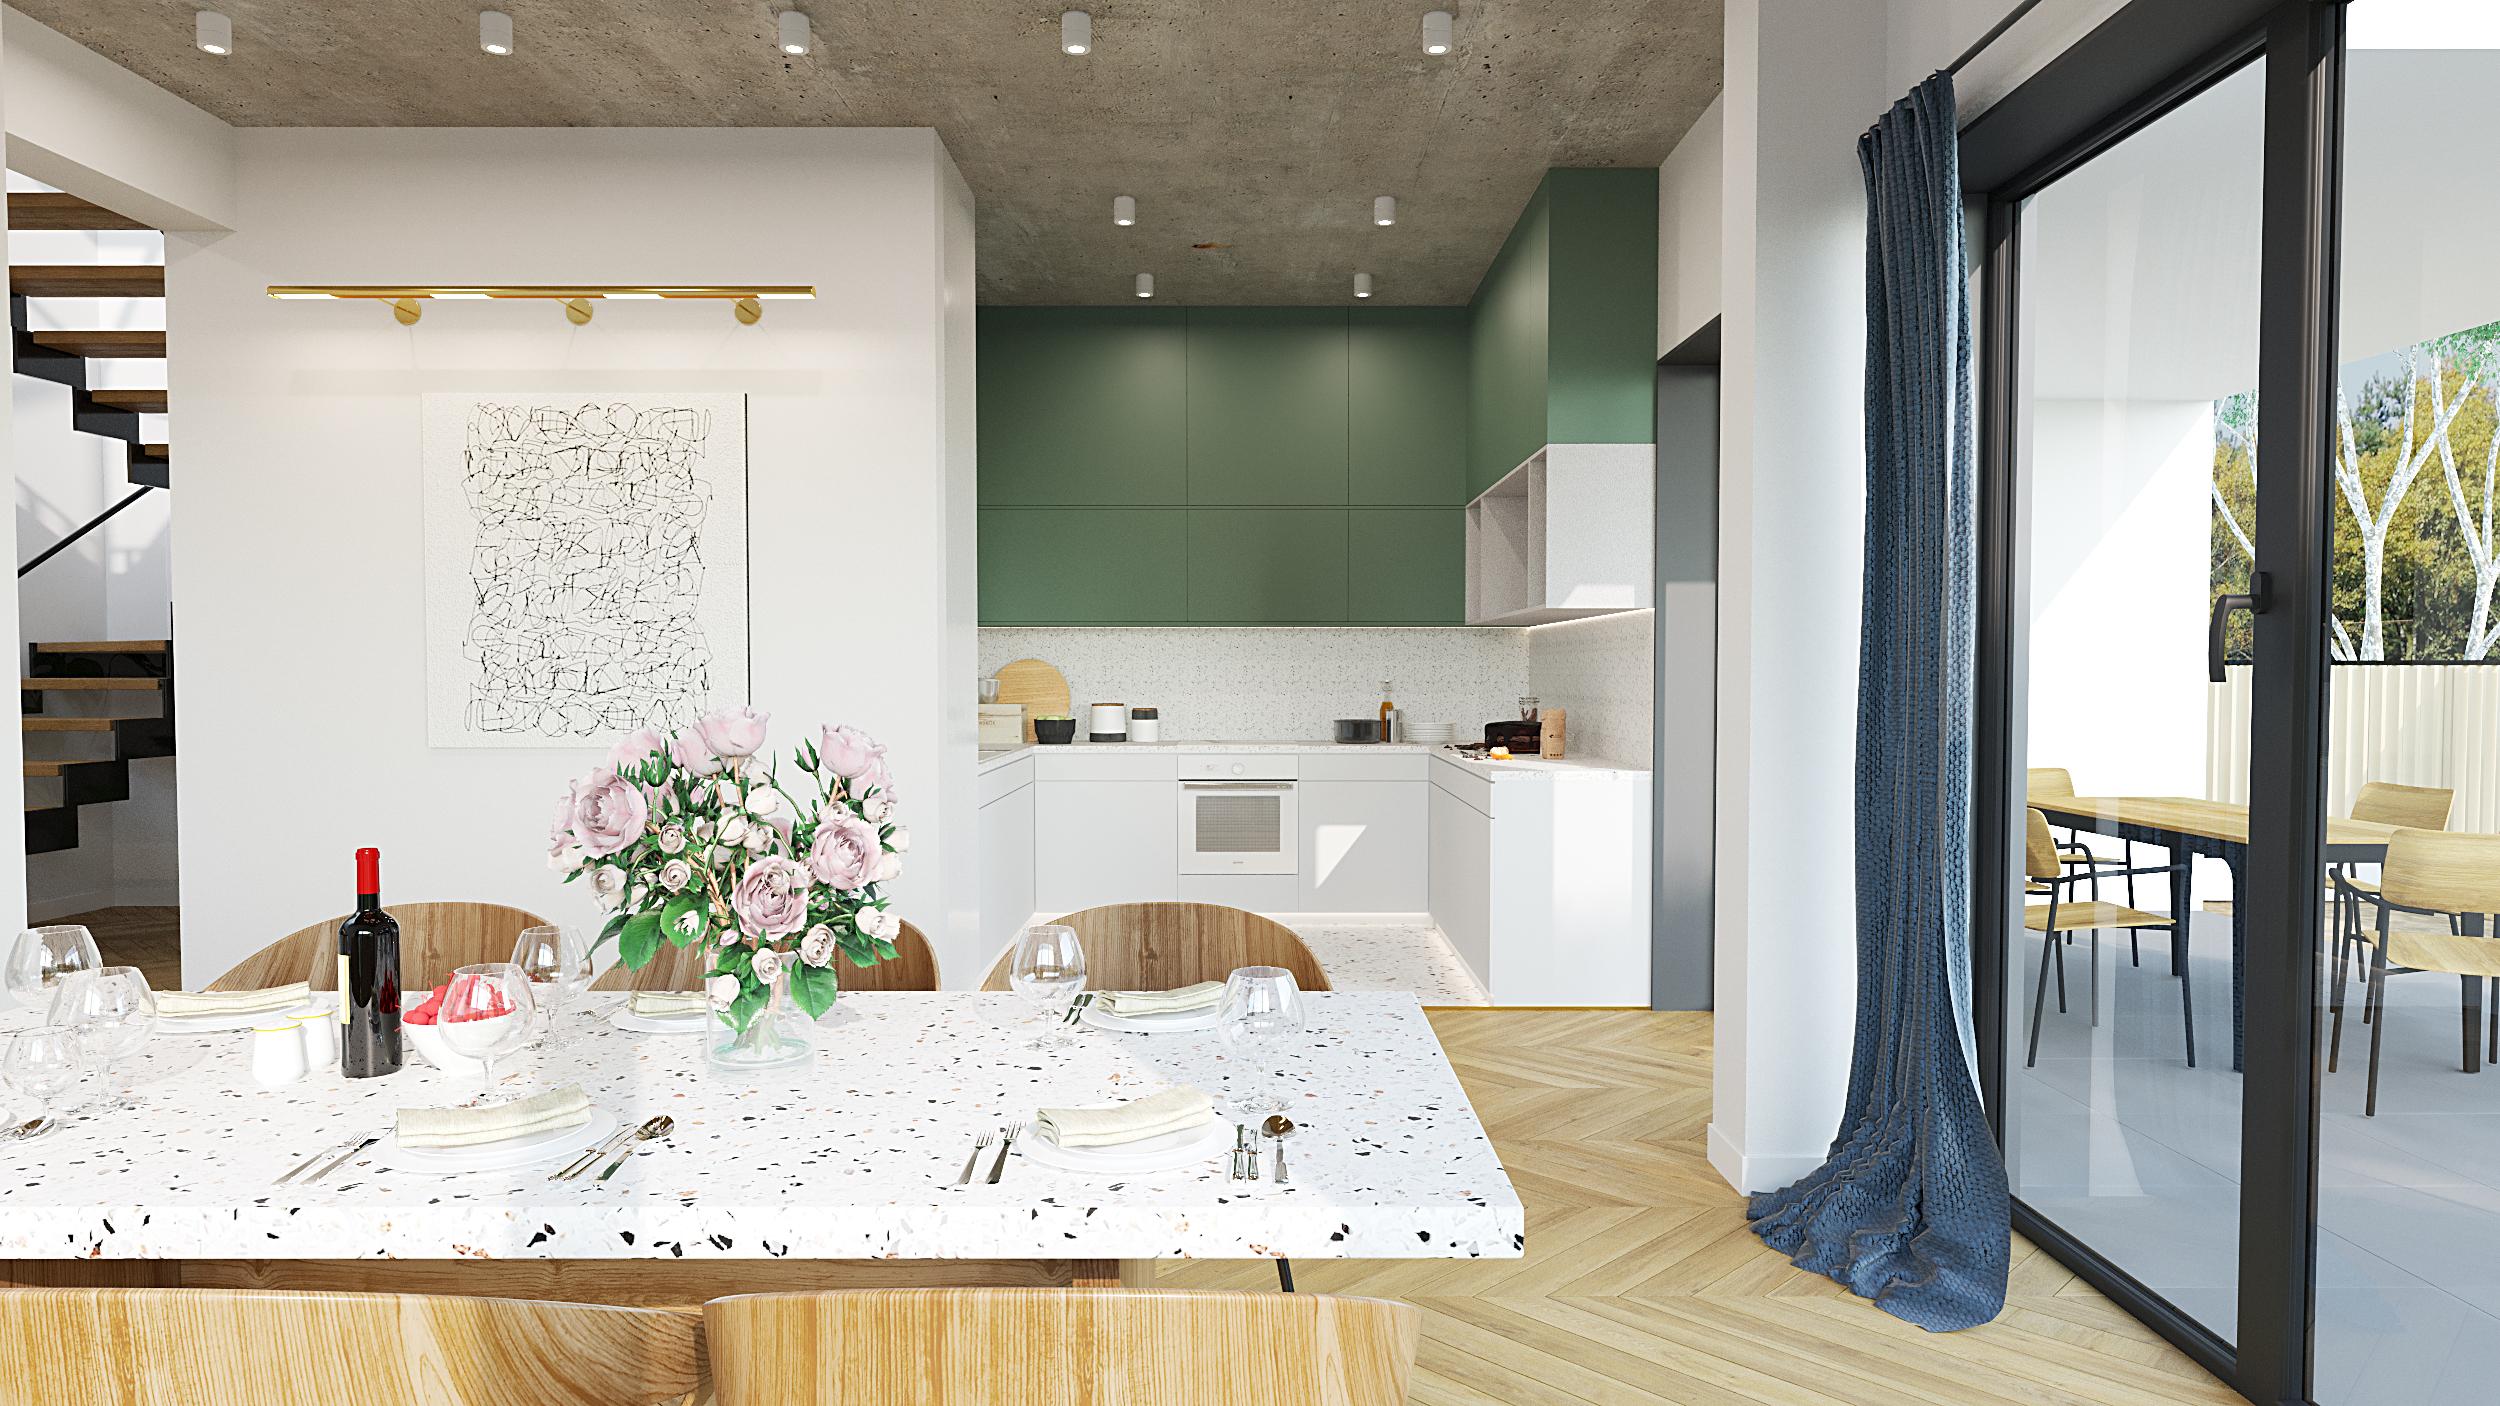 https://nbc-arhitect.ro/wp-content/uploads/2020/10/NBC-Arhitect-_-residential-_-Grand-Home-Residence-_-Romania_9.jpg